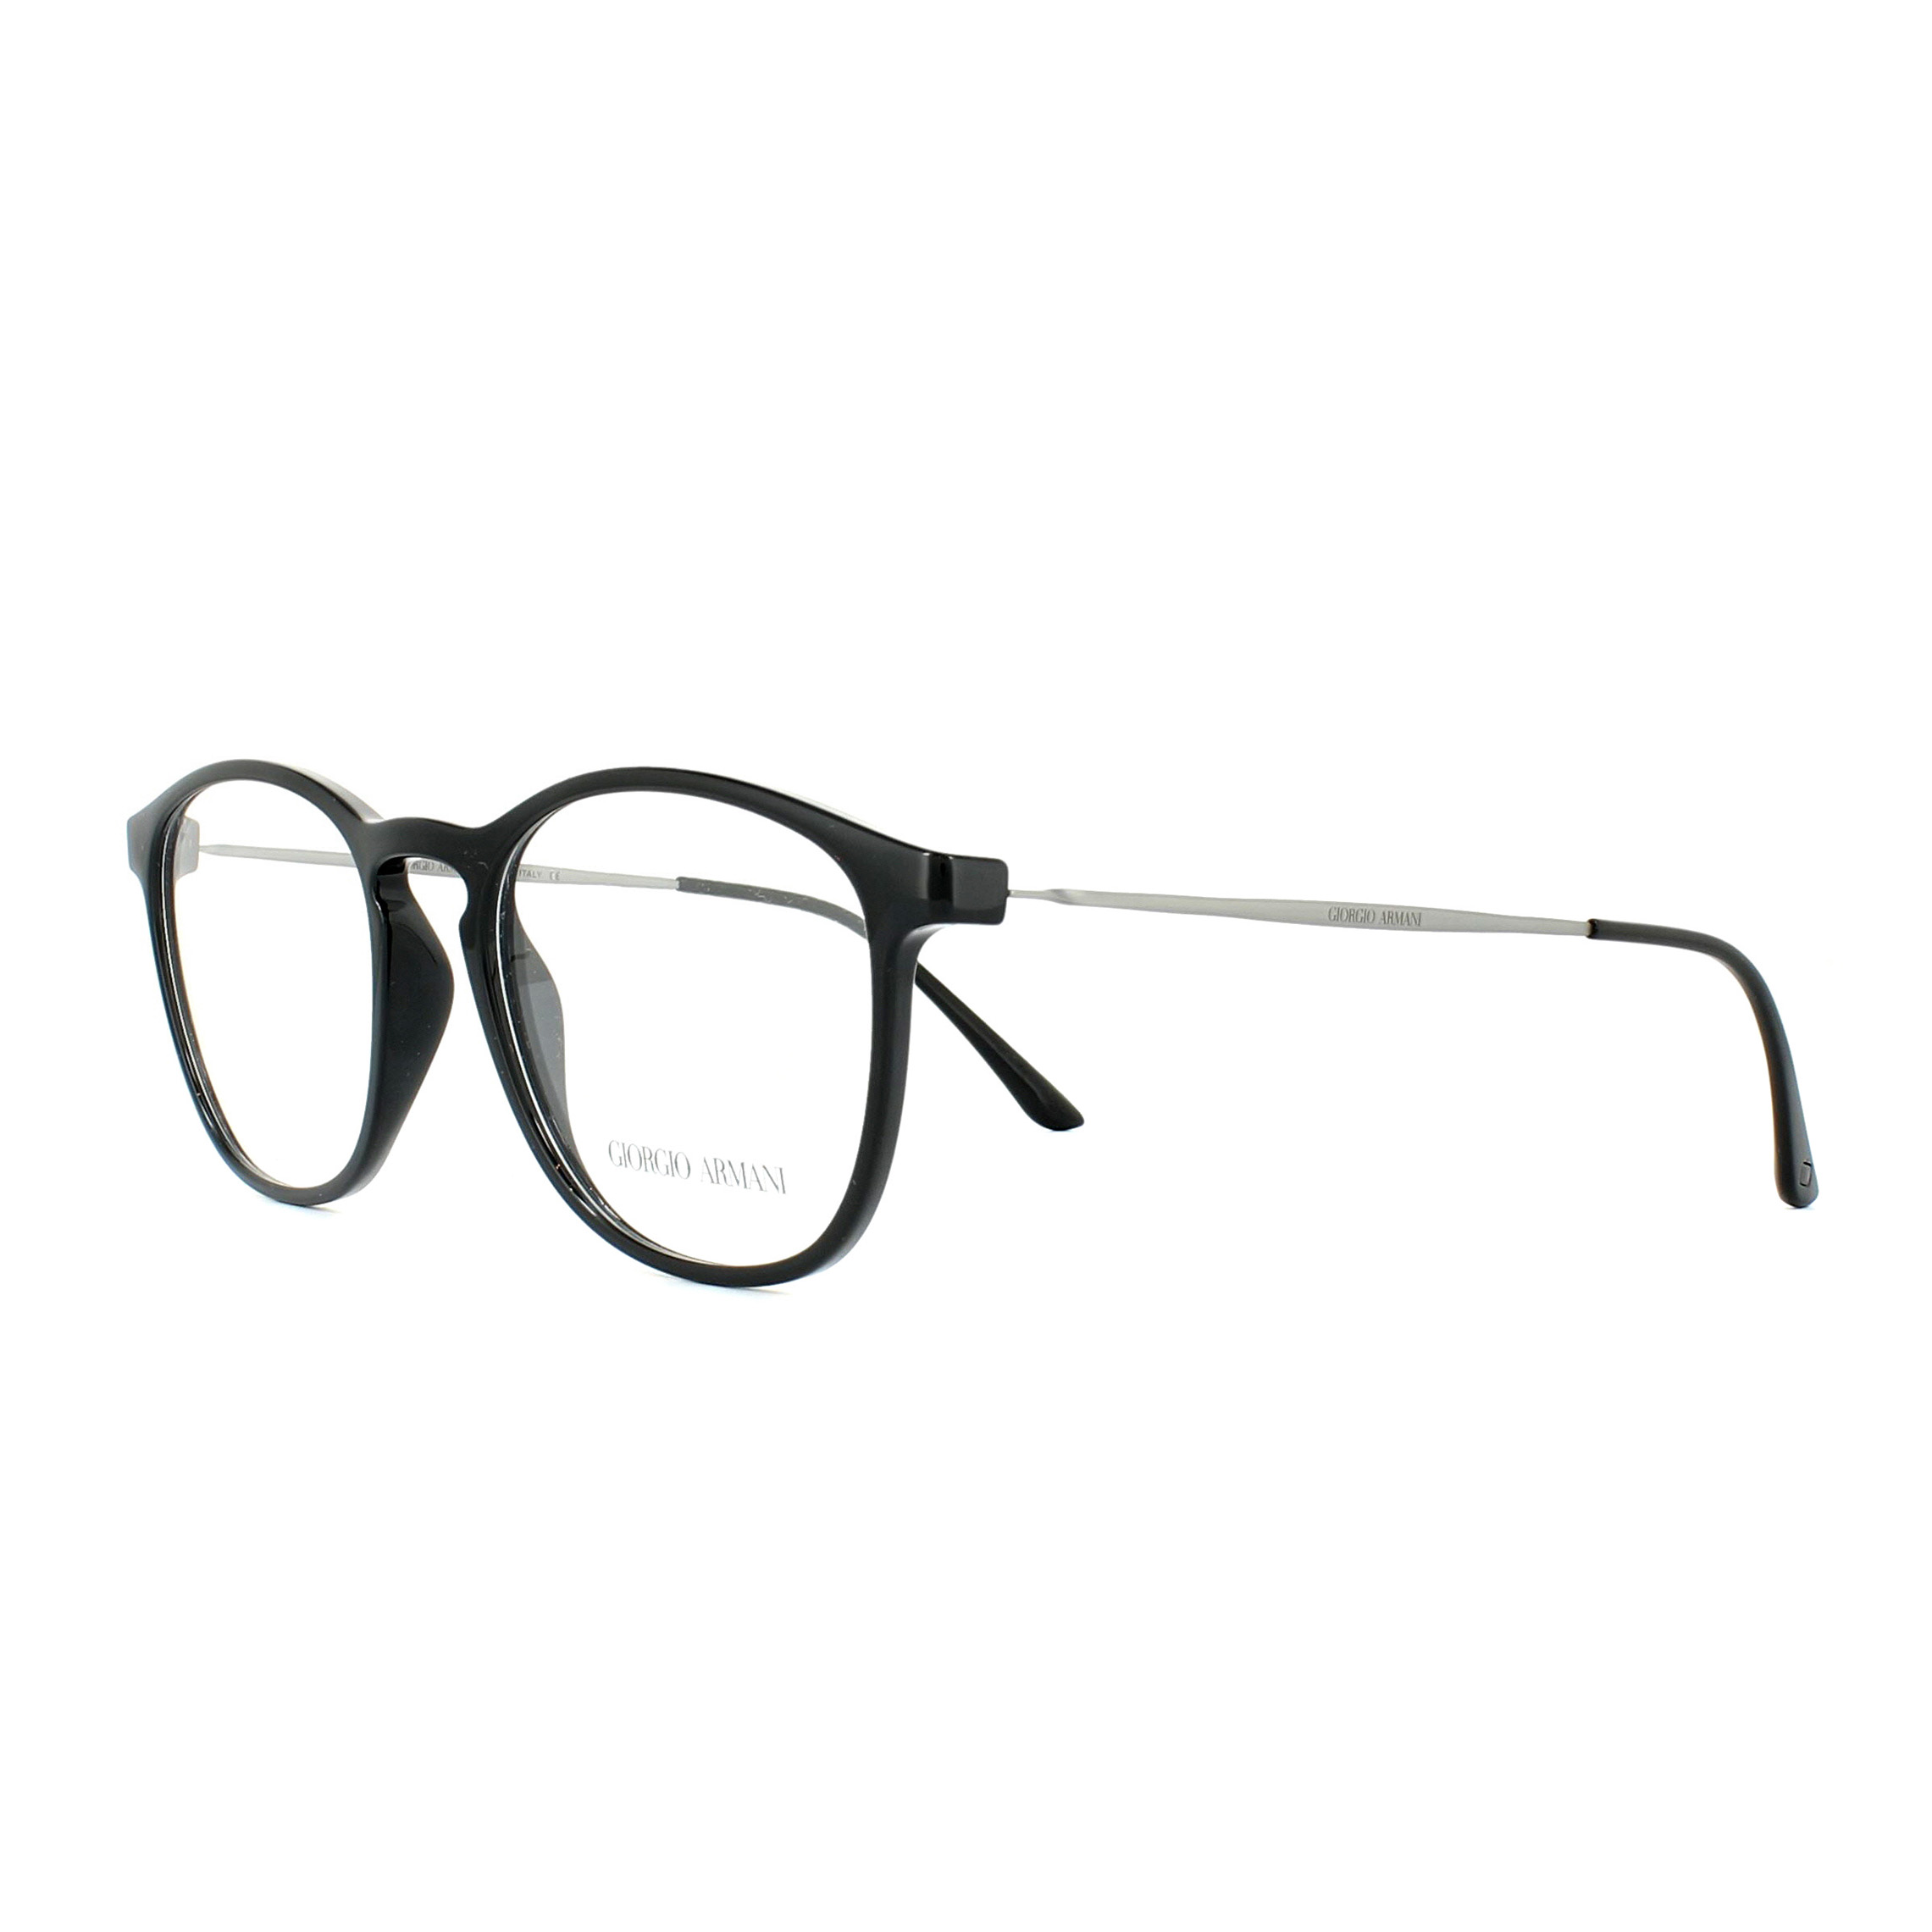 f91f4944a1c Sentinel Giorgio Armani Glasses Frames AR7141 5017 Black 52mm Mens